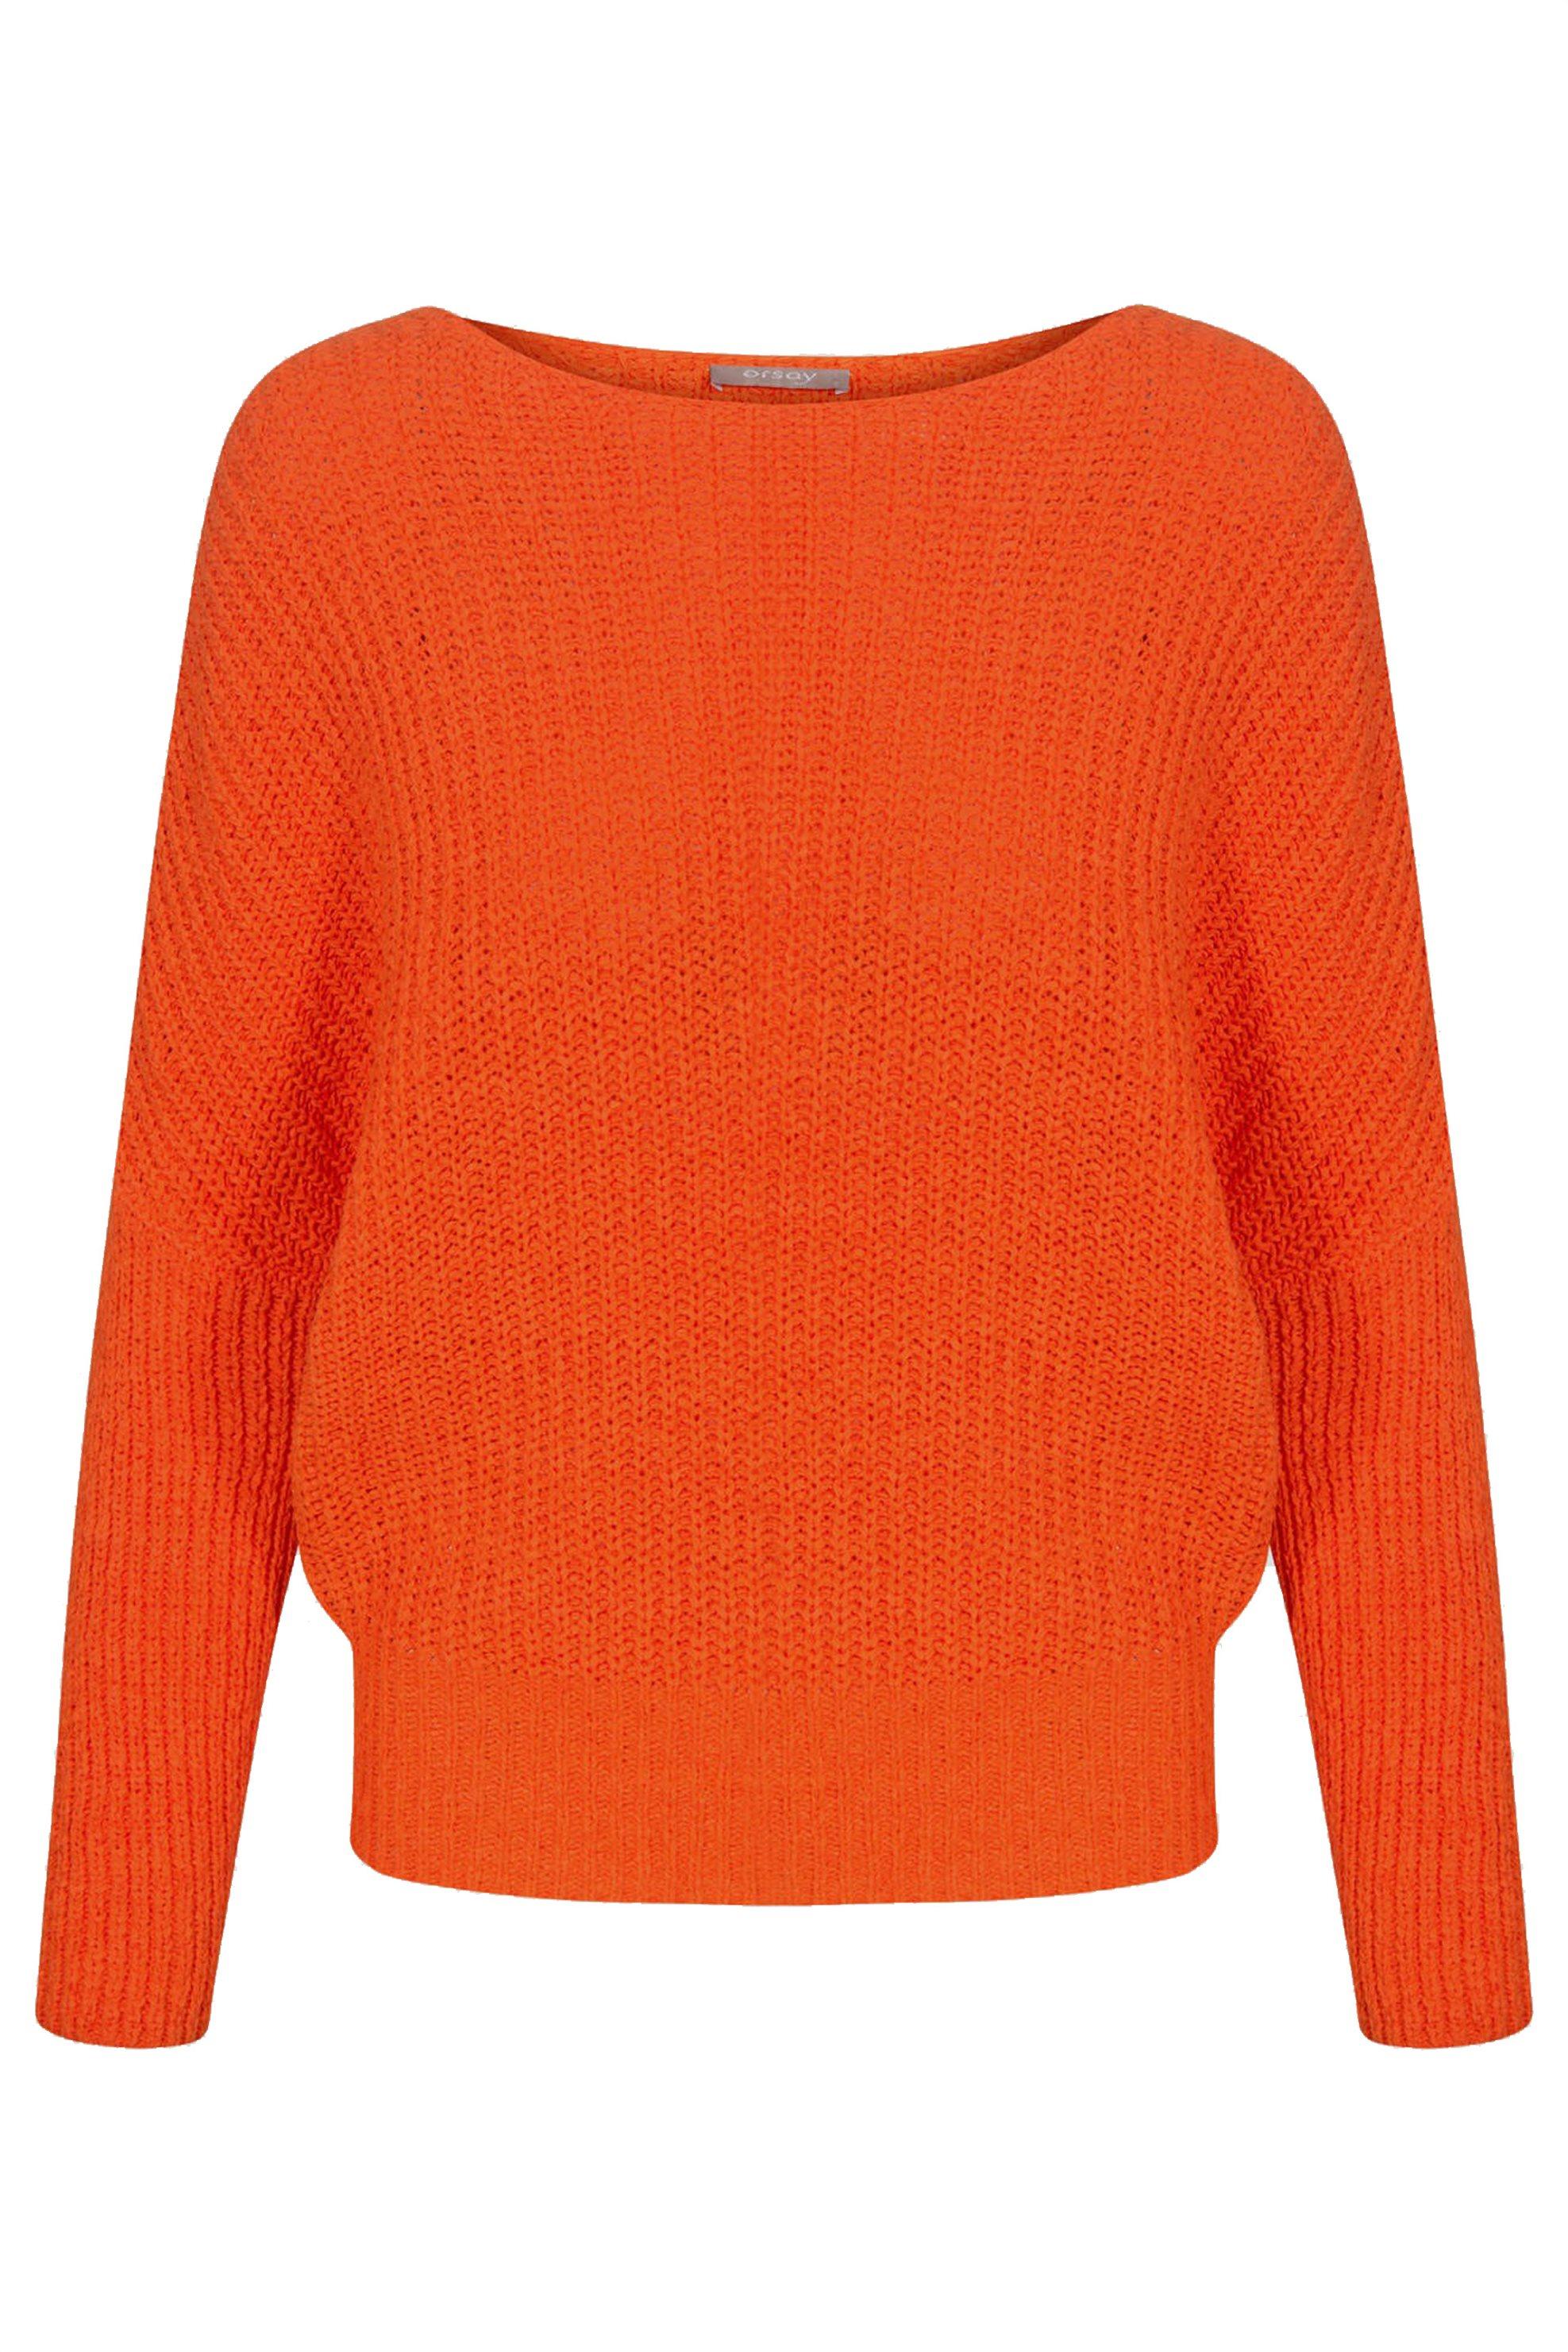 23174c400ea3 Γυναικεία   Ρούχα   Πλεκτά   TROLL TROLL γυναικεια μπλουζα ...